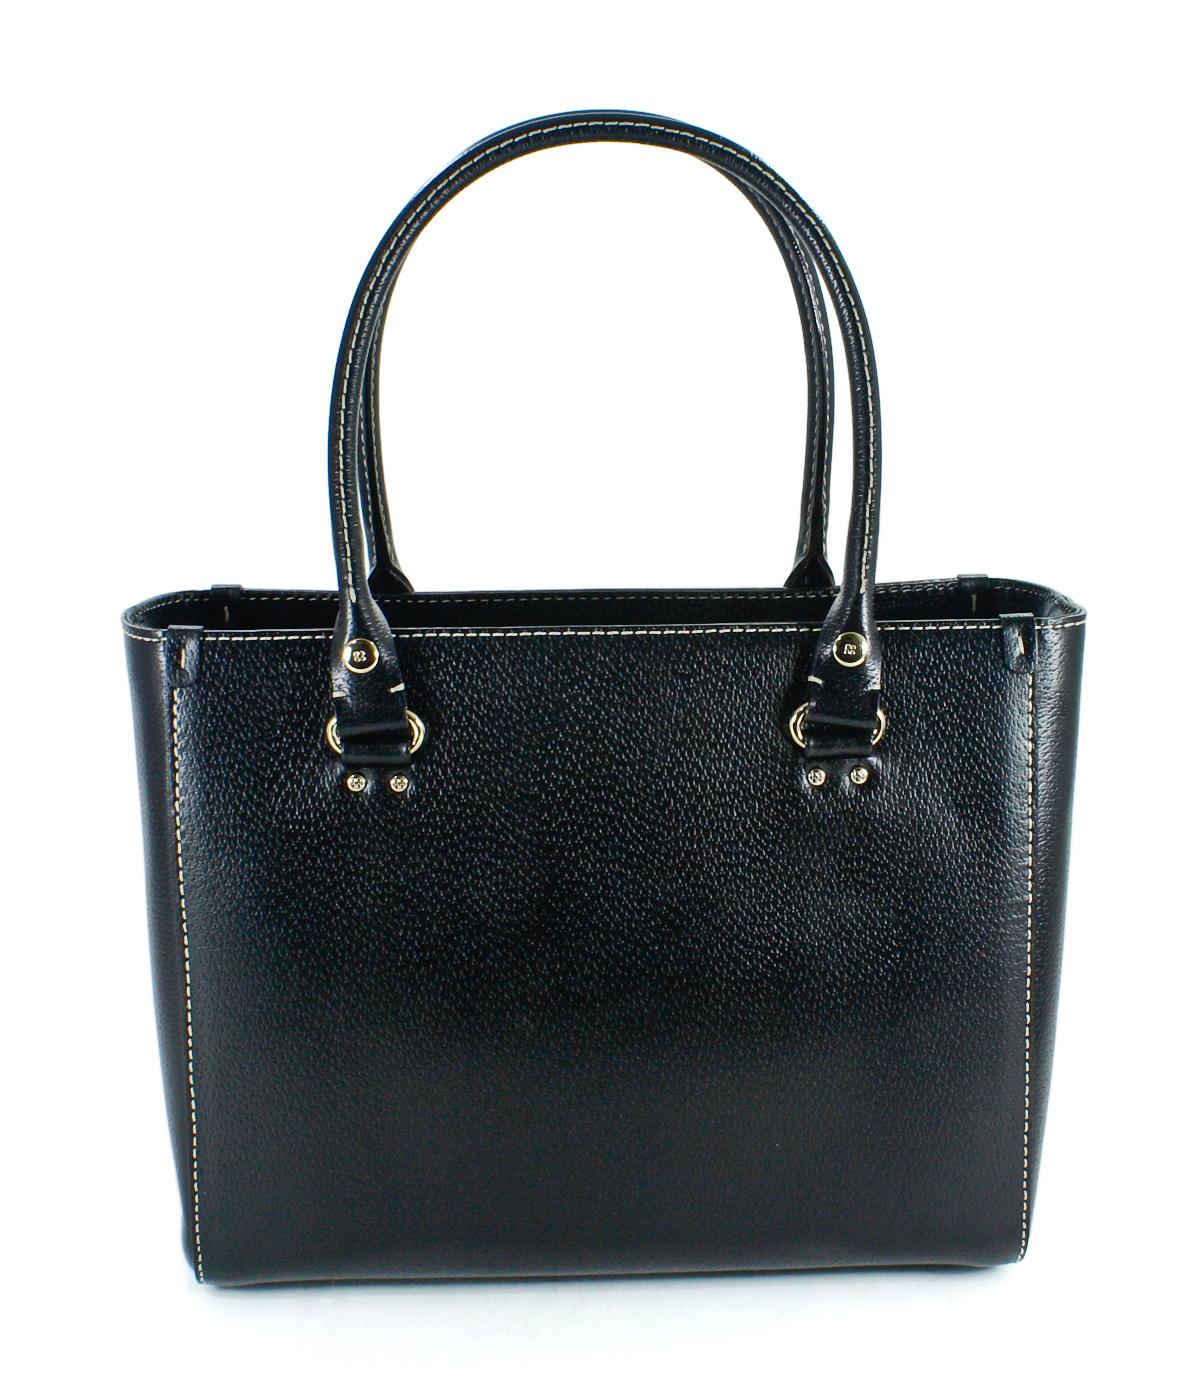 Kate Spade Quinn Wellesley Black Leather Handbag New